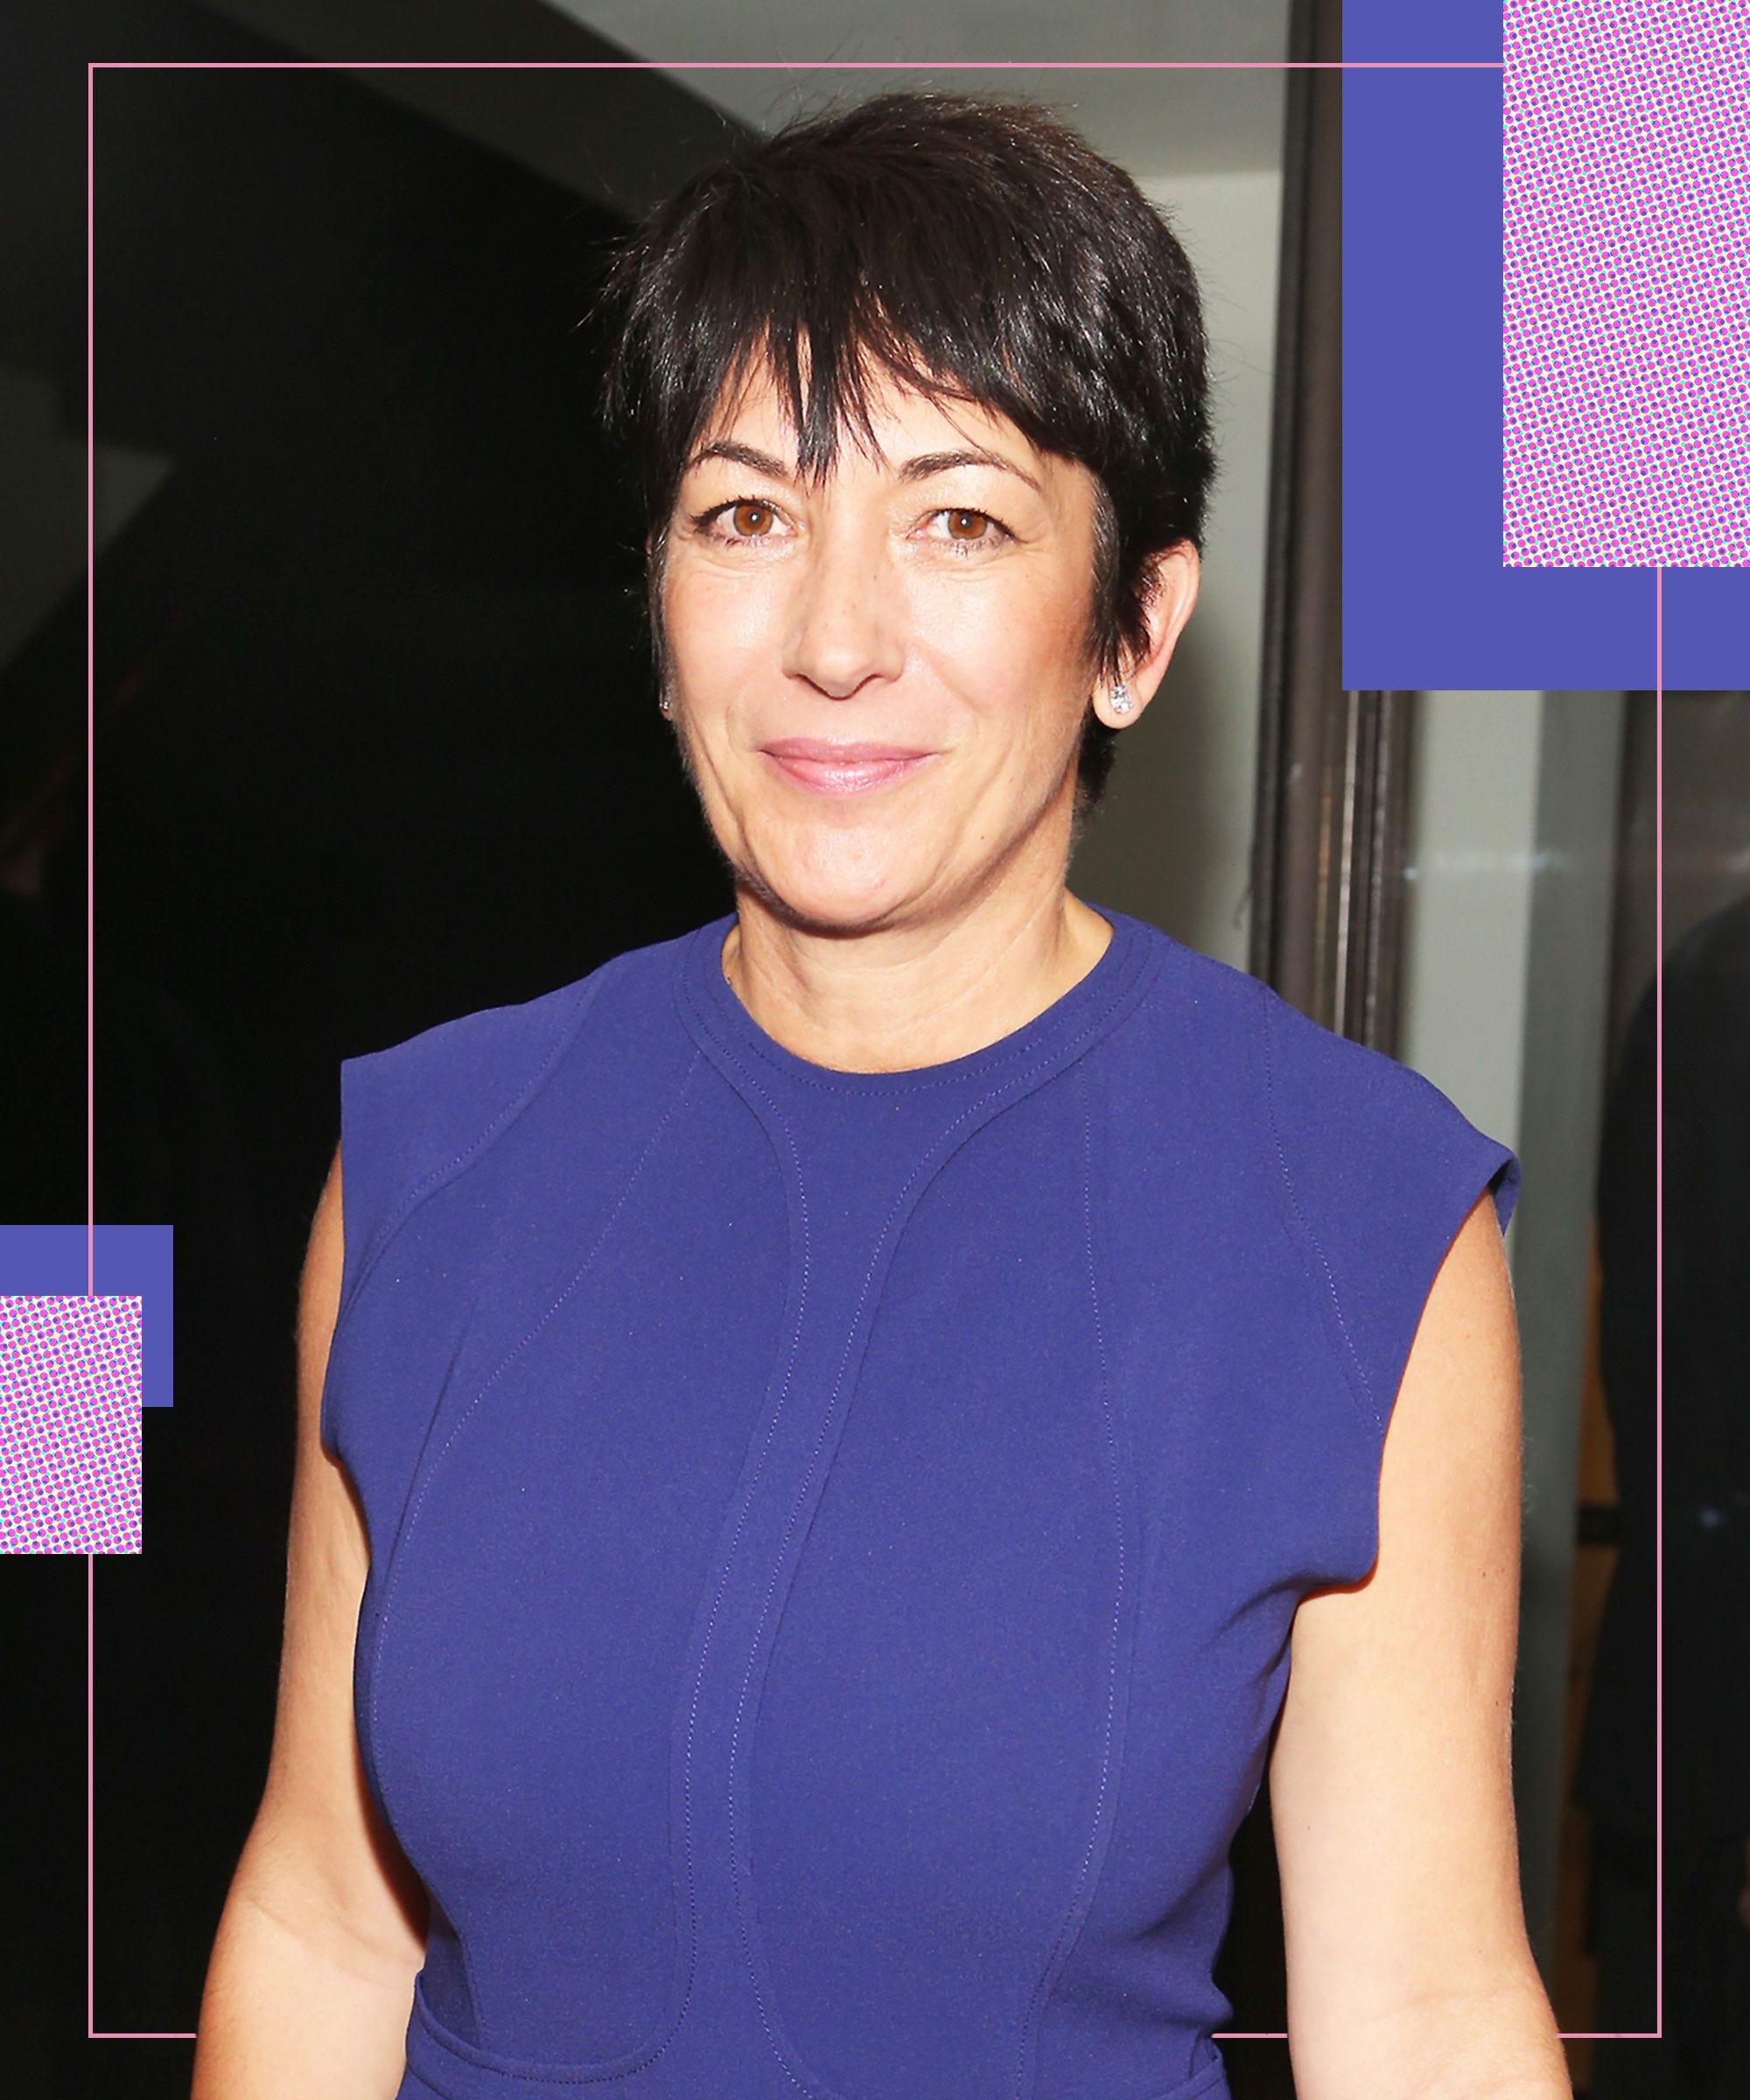 After Epstein's Death, Focus On Ghislaine Maxwell Intensifies